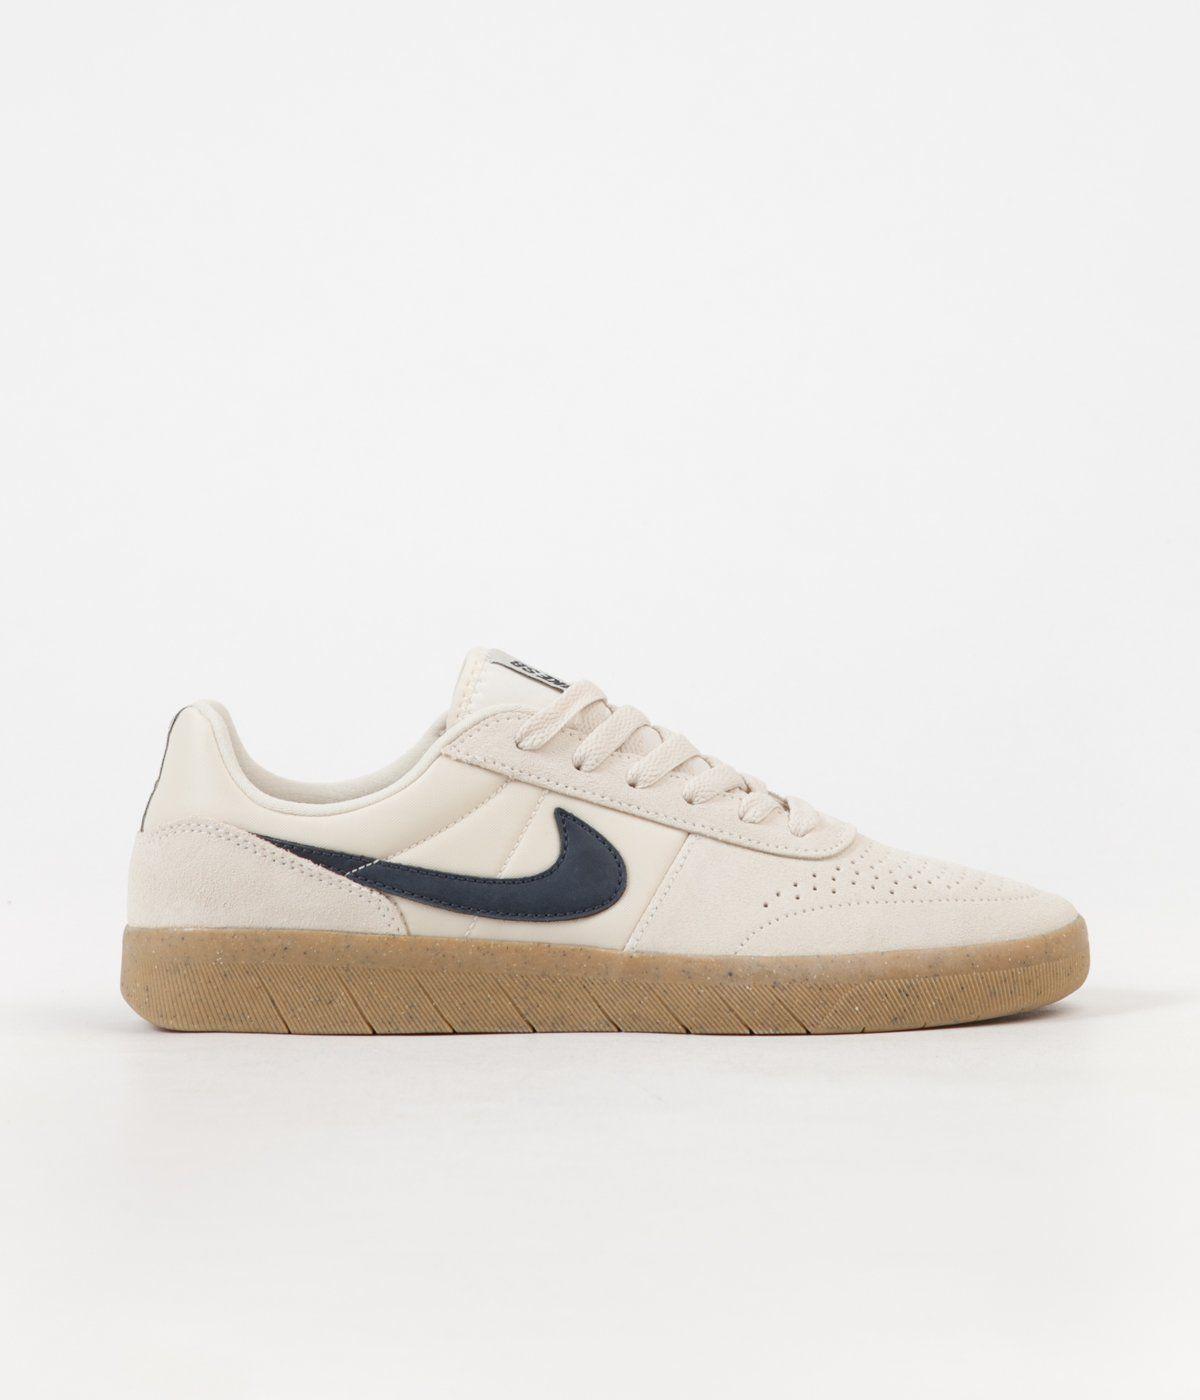 Nike SB Team Classic Shoes - Light